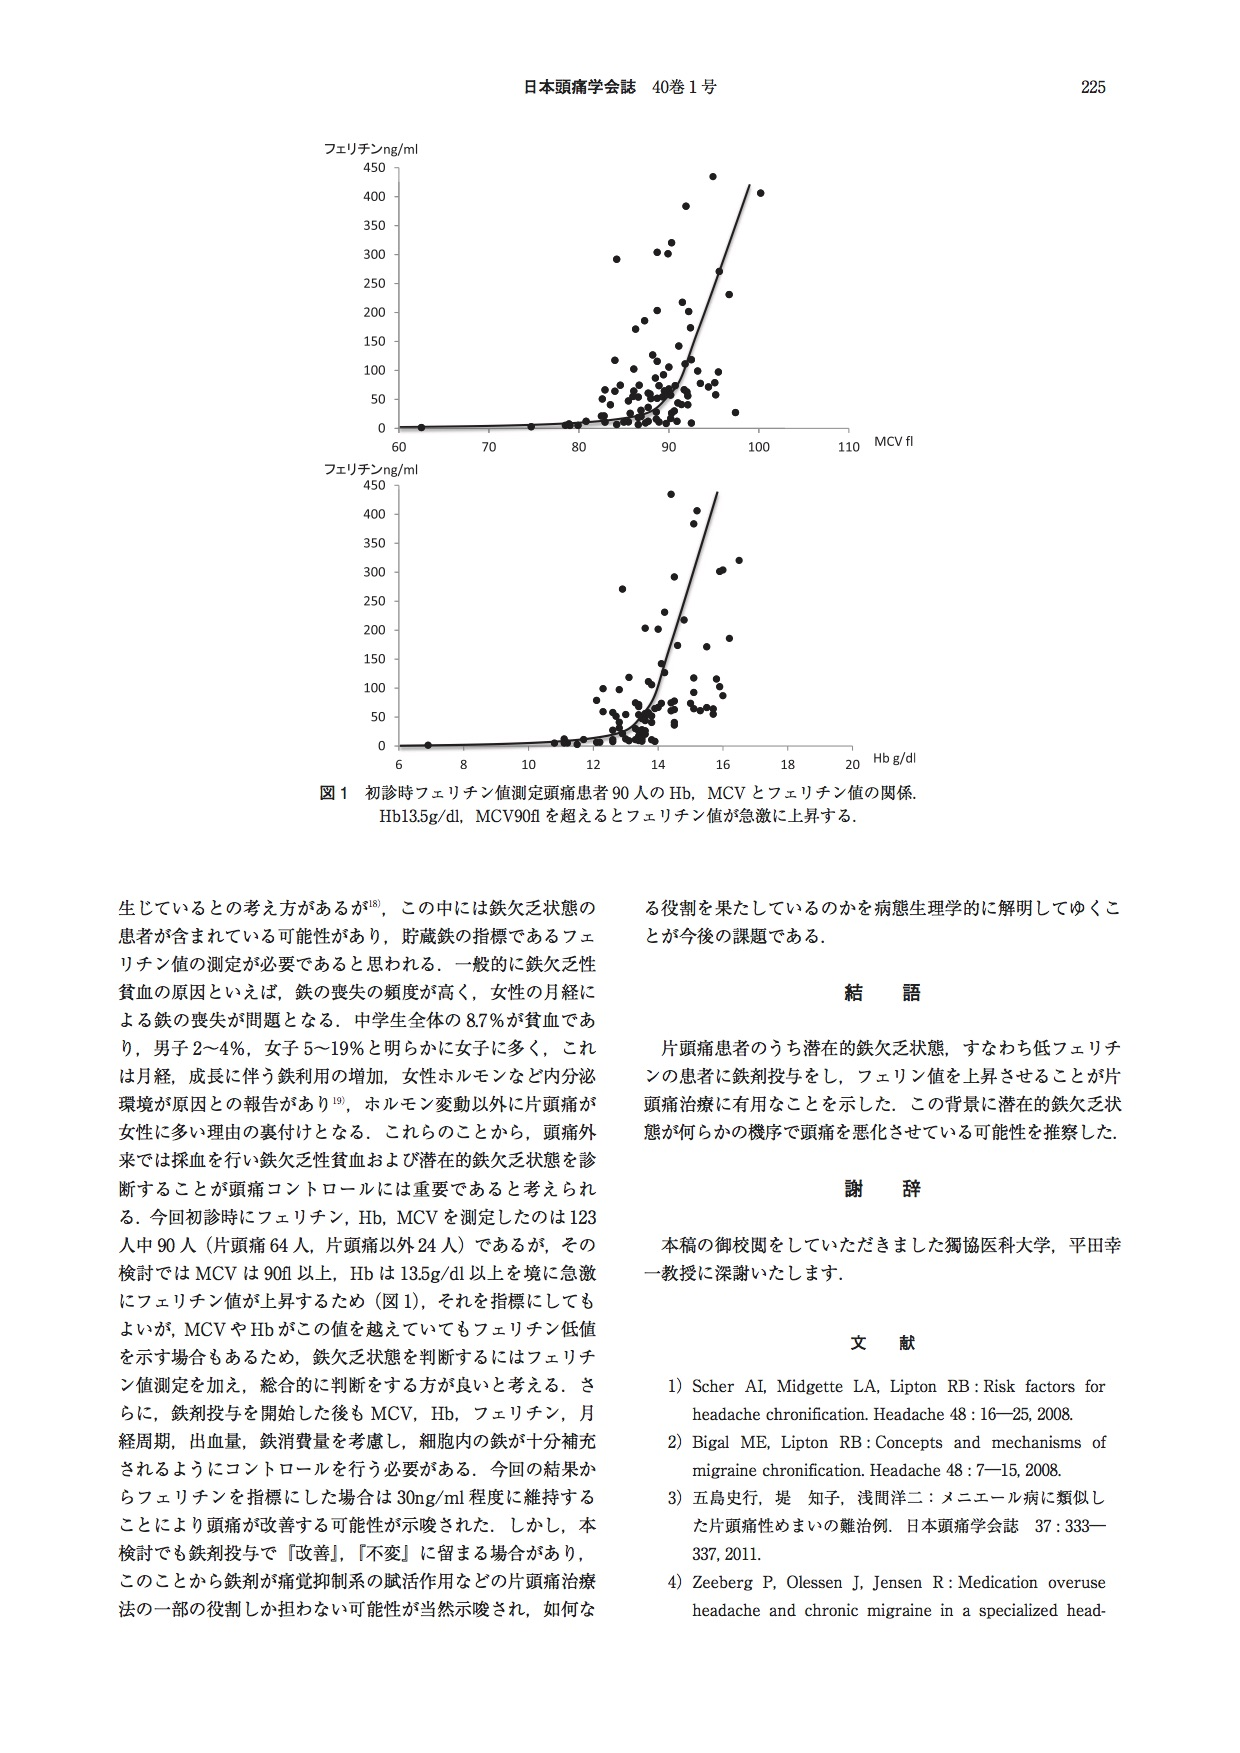 2013_40_no1.鉄剤投与pdf-5.jpg